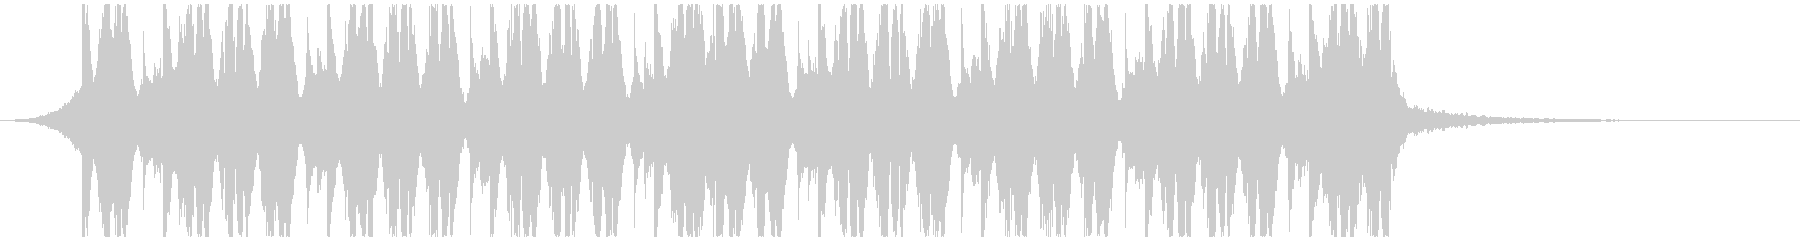 Future Pop 3の未再生の波形